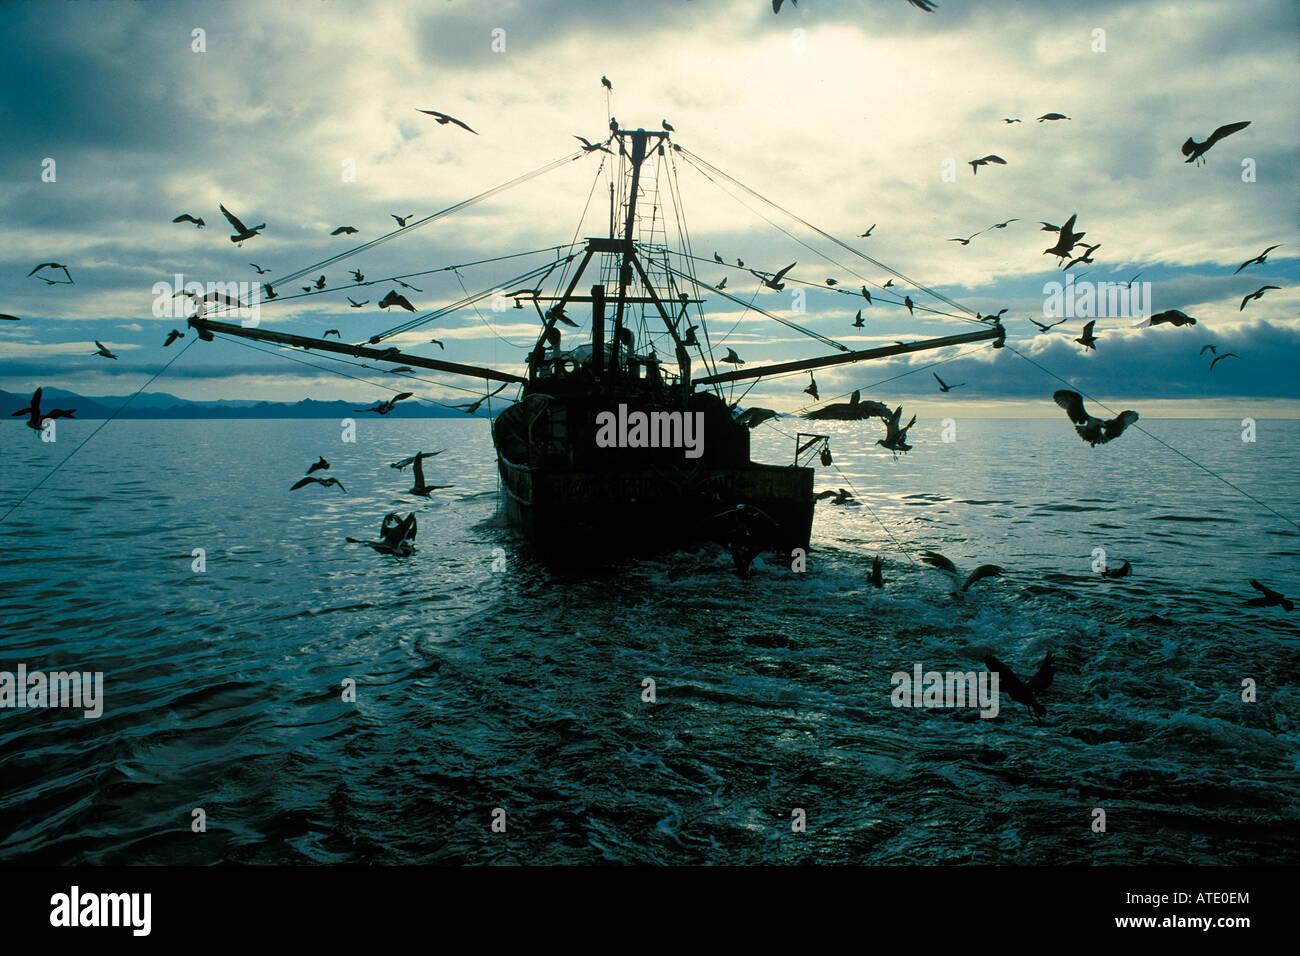 Shrimp commercial fishery using destructive otter trawl nets, Sea of Cortez, Mexico. - Stock Image